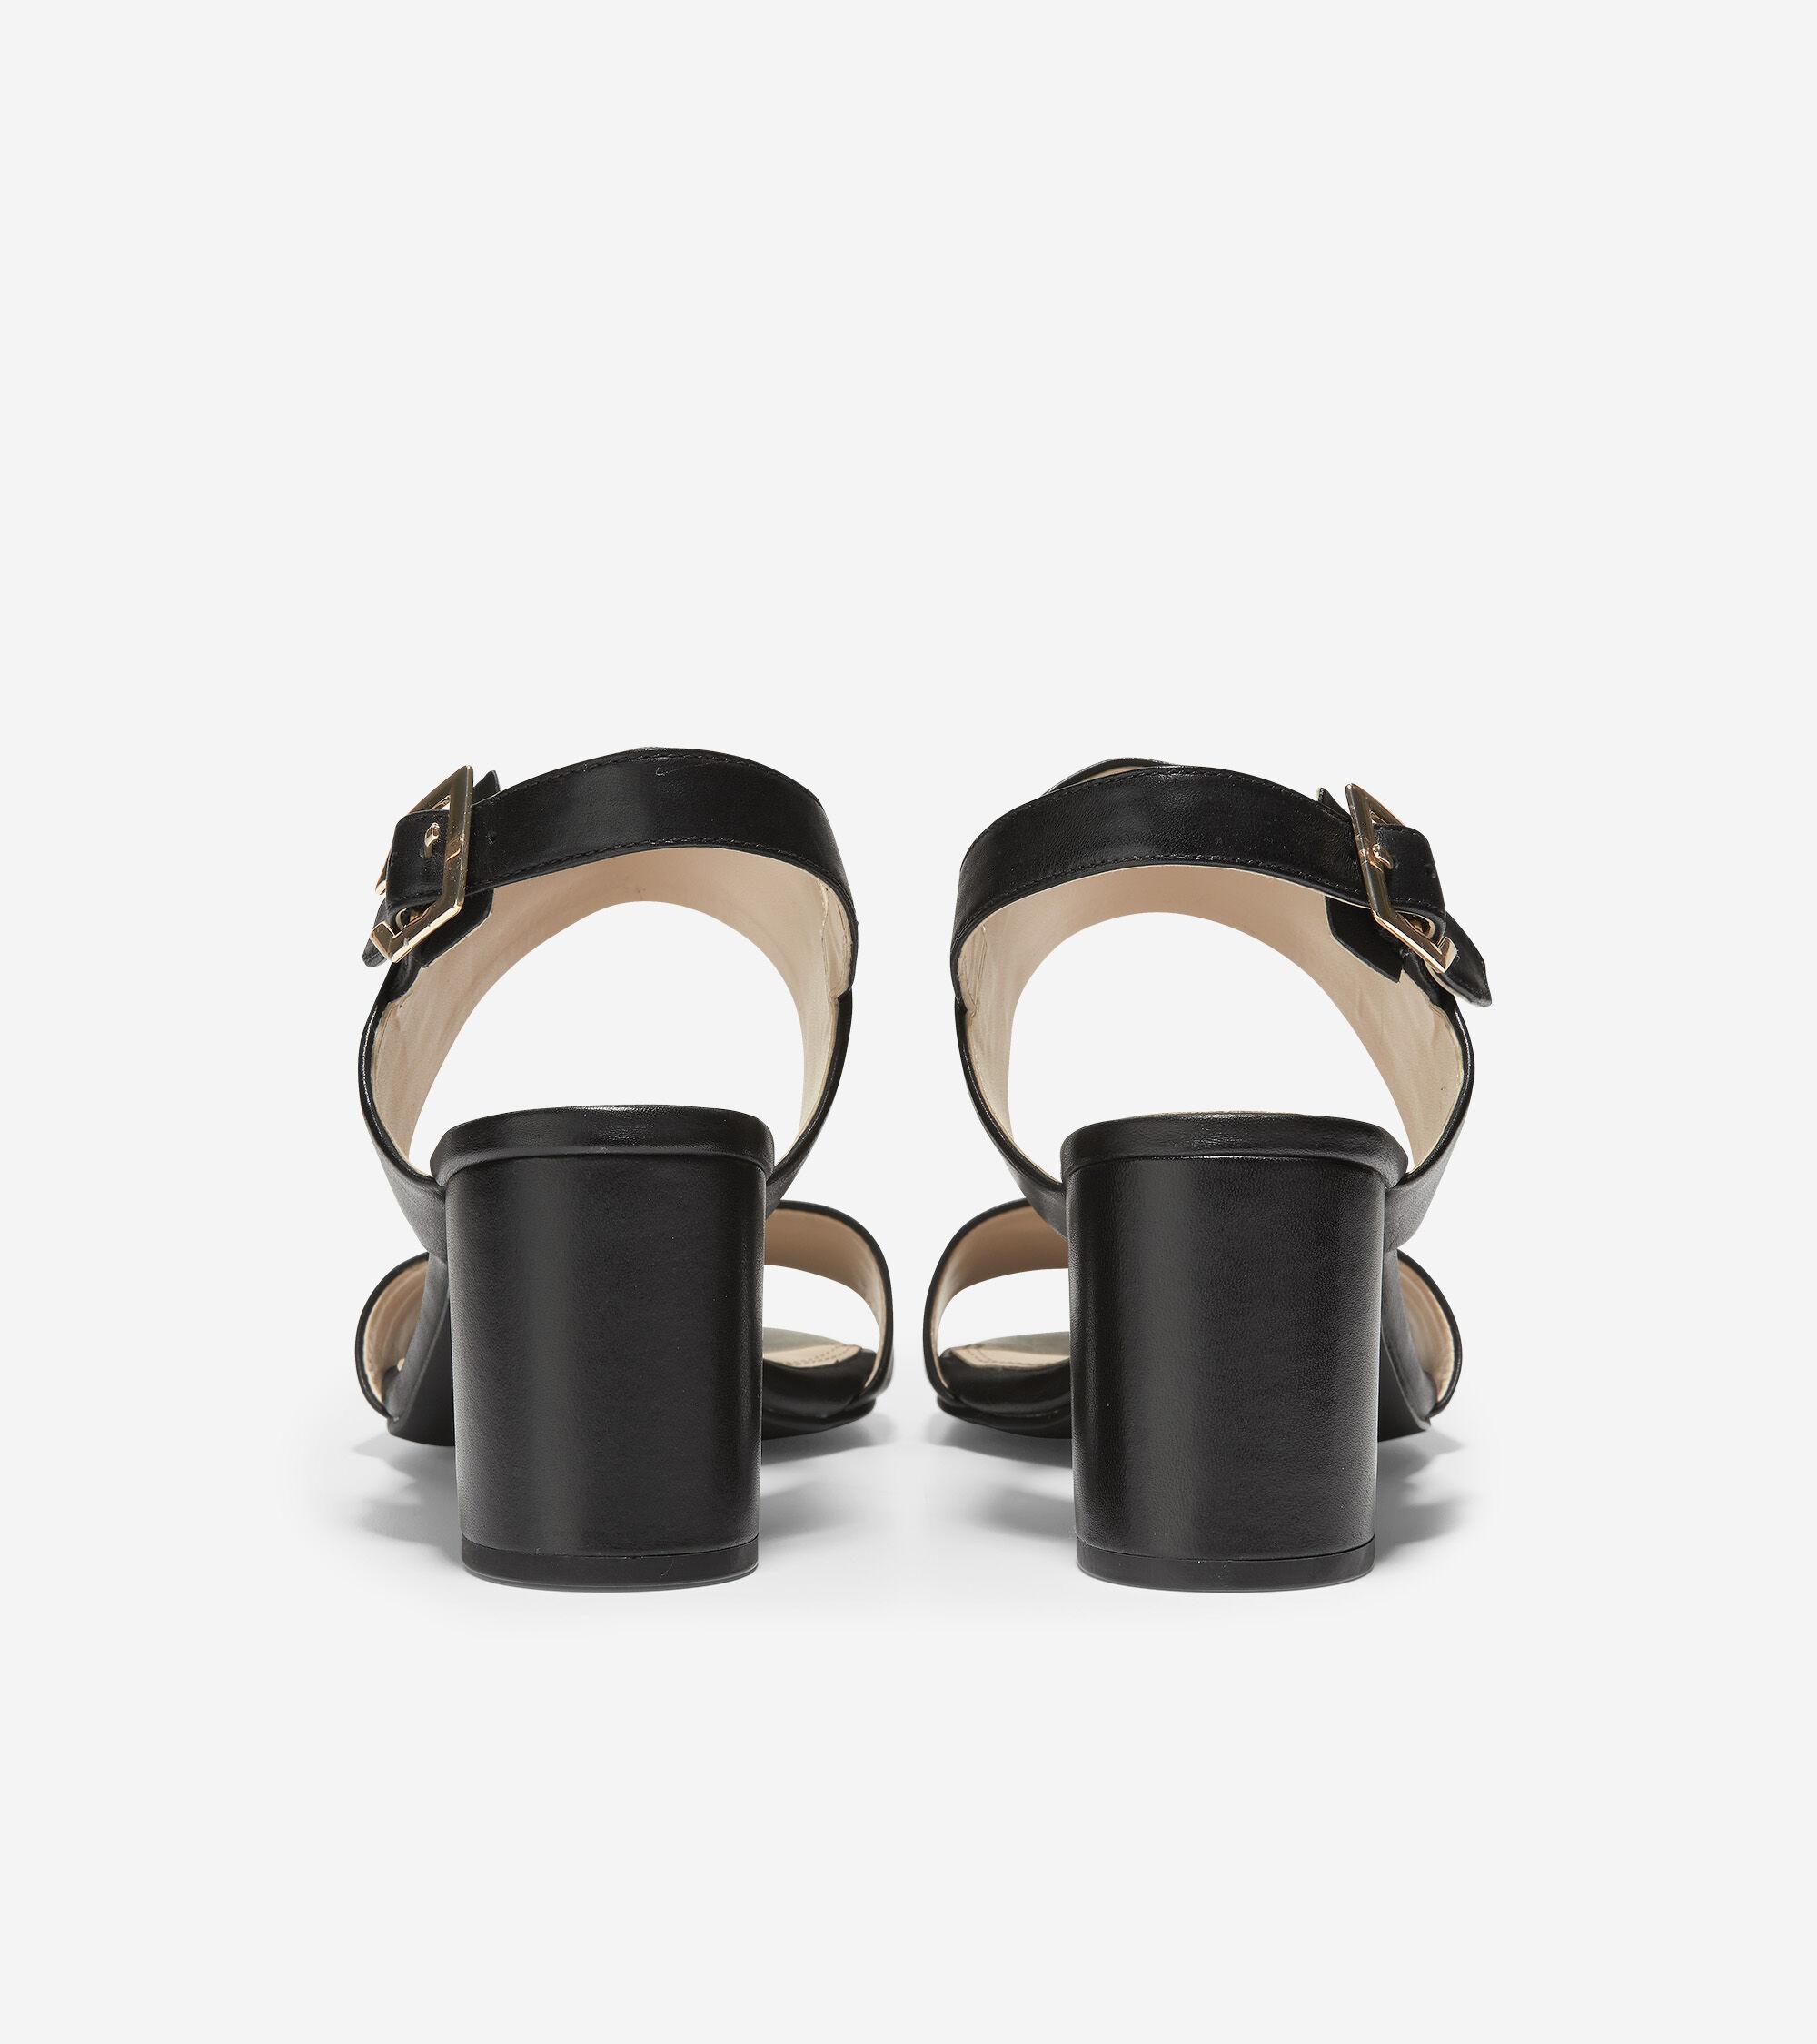 7606d0631d Women's Avani City Sandals (65mm) in Black | Cole Haan